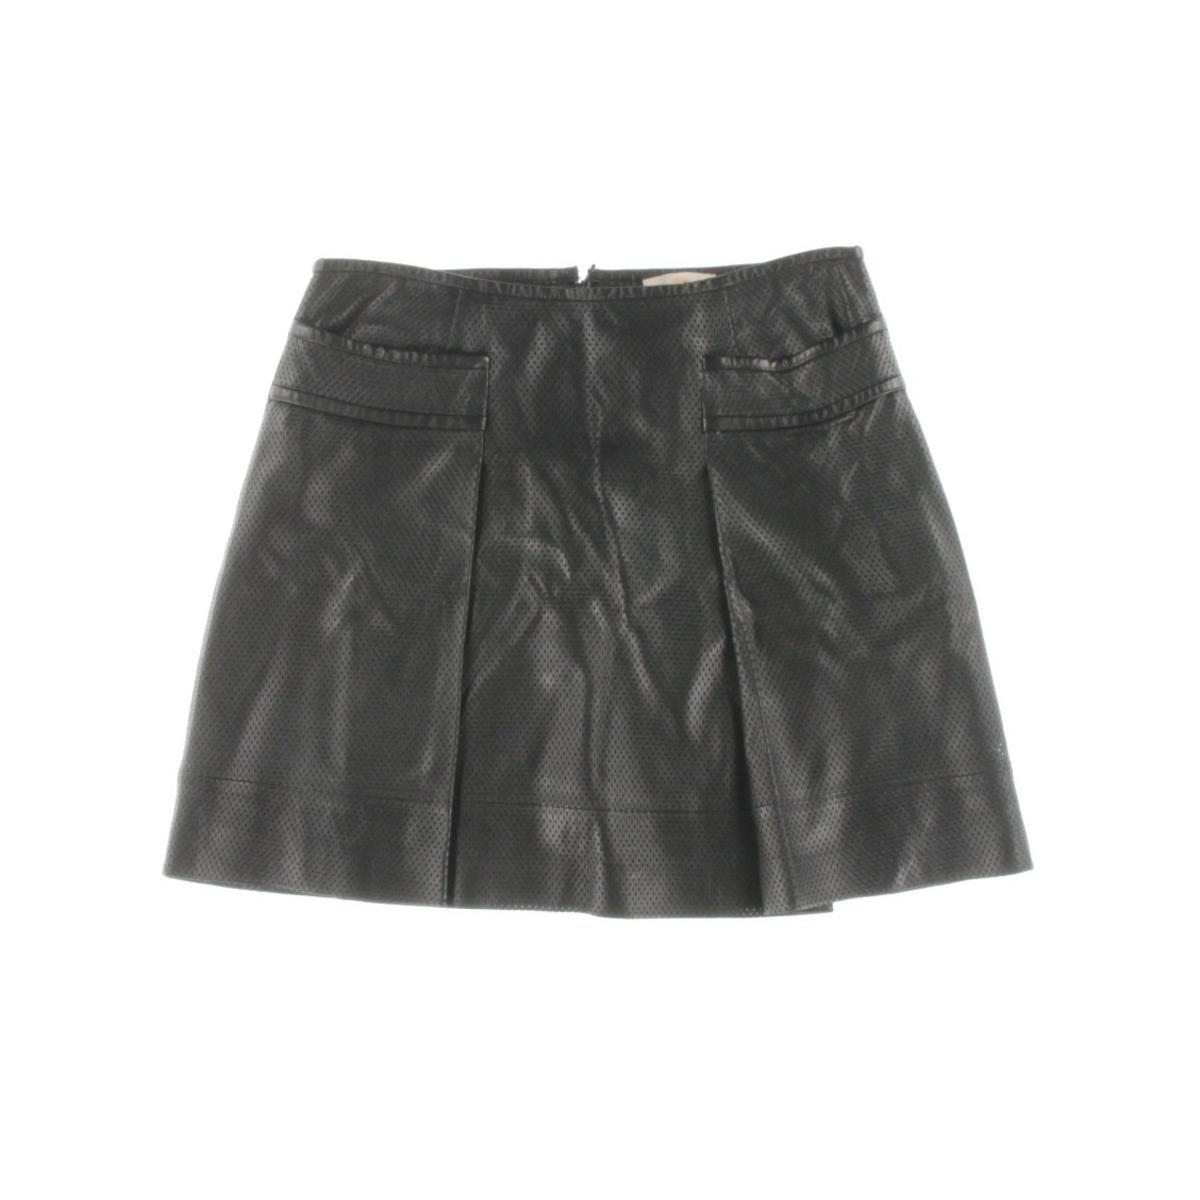 Tory Burch Womens Leather Pleated Mini Skirt Black 6